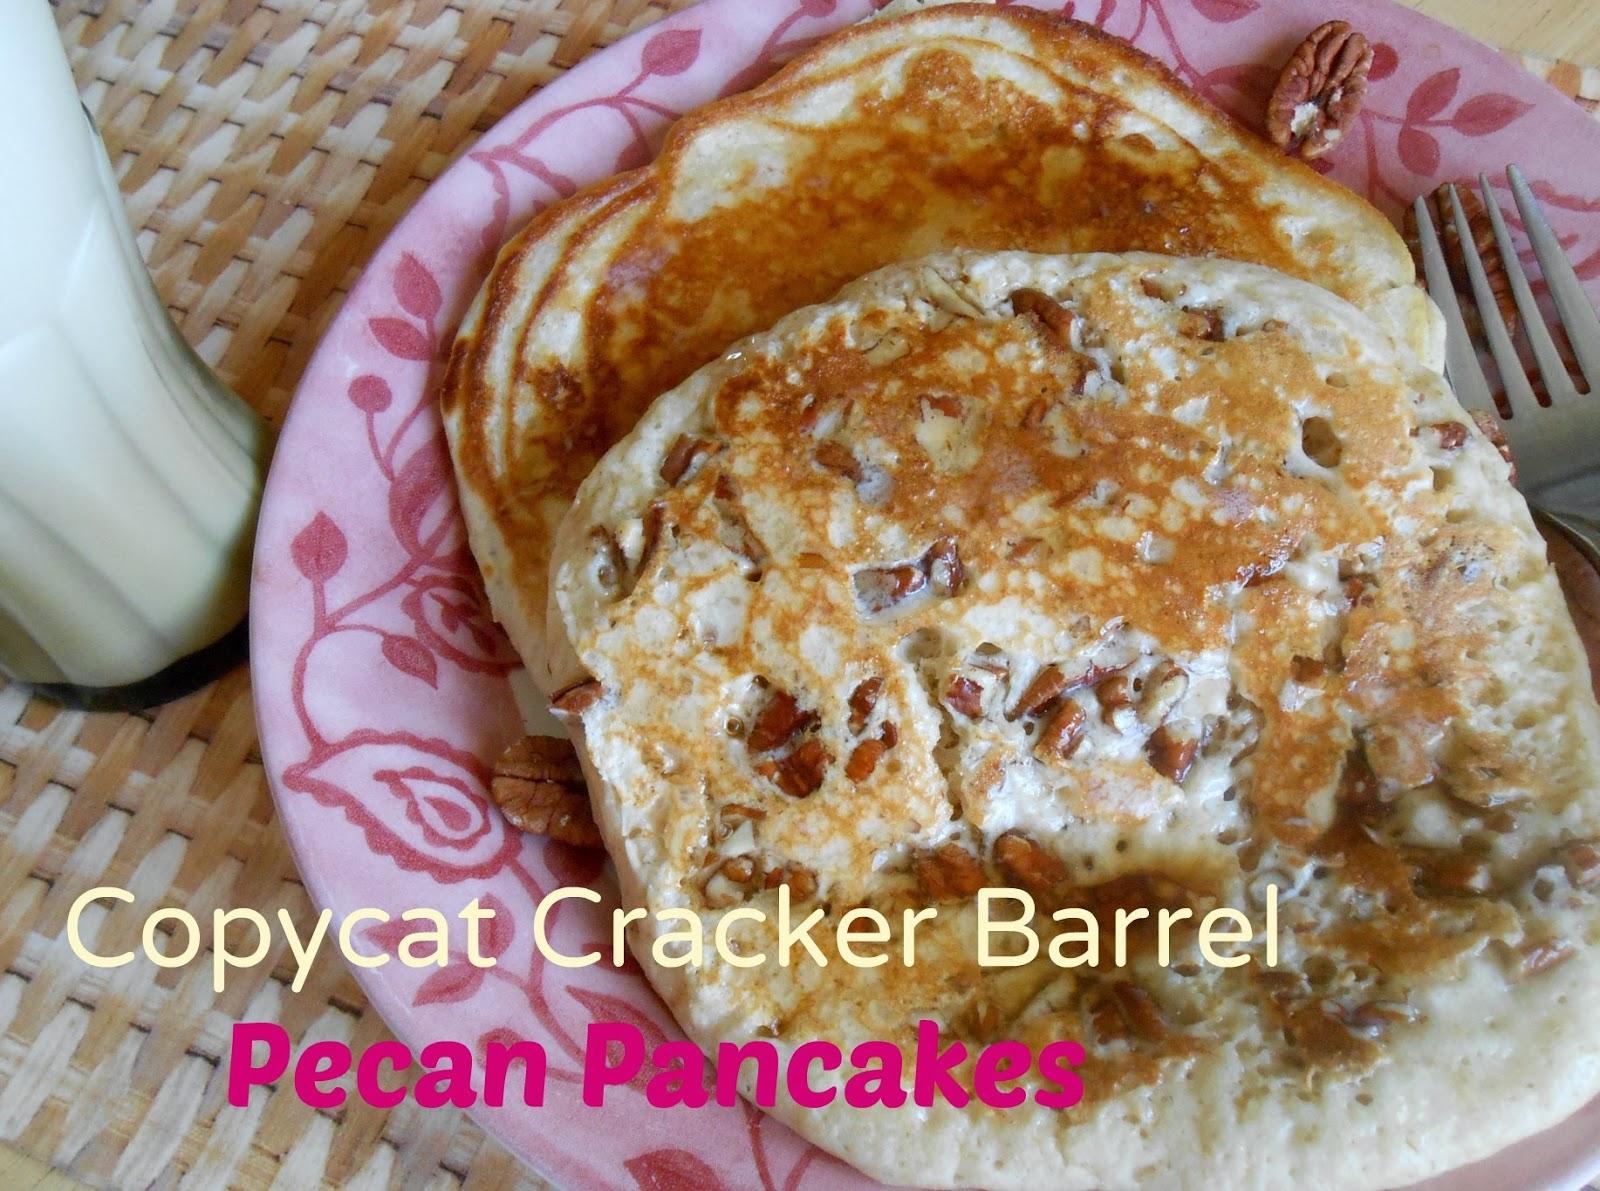 The Better Baker: Copycat Cracker Barrel Pecan Pancakes